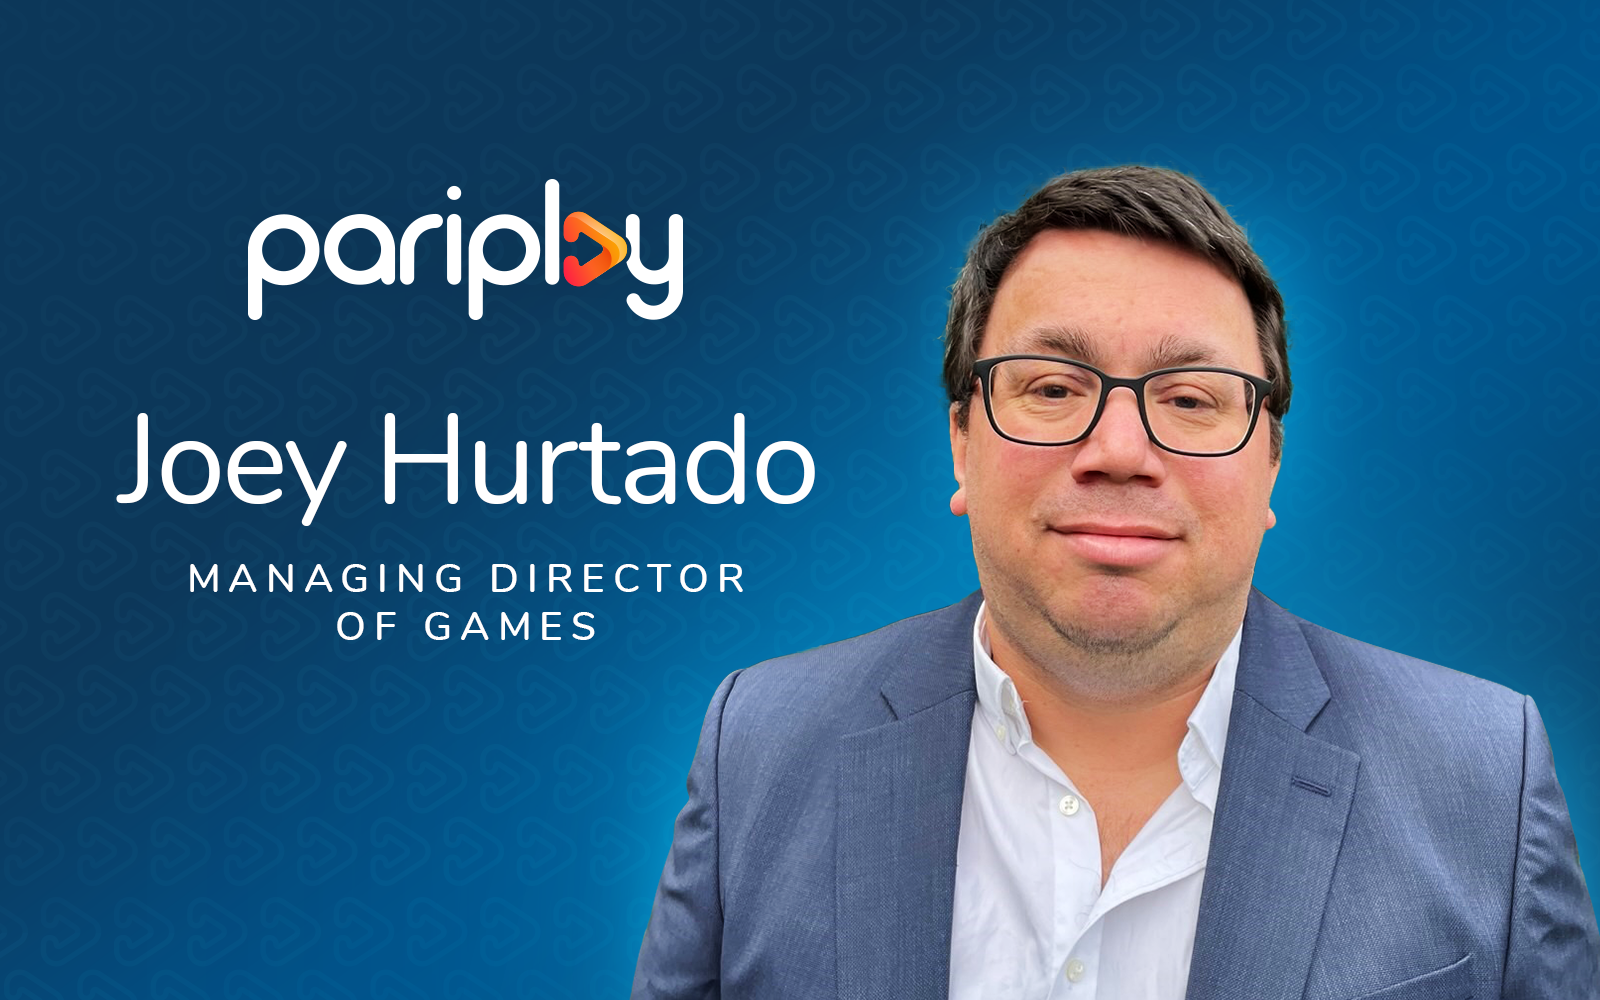 Joey Hurtado - New Managing Director of Games